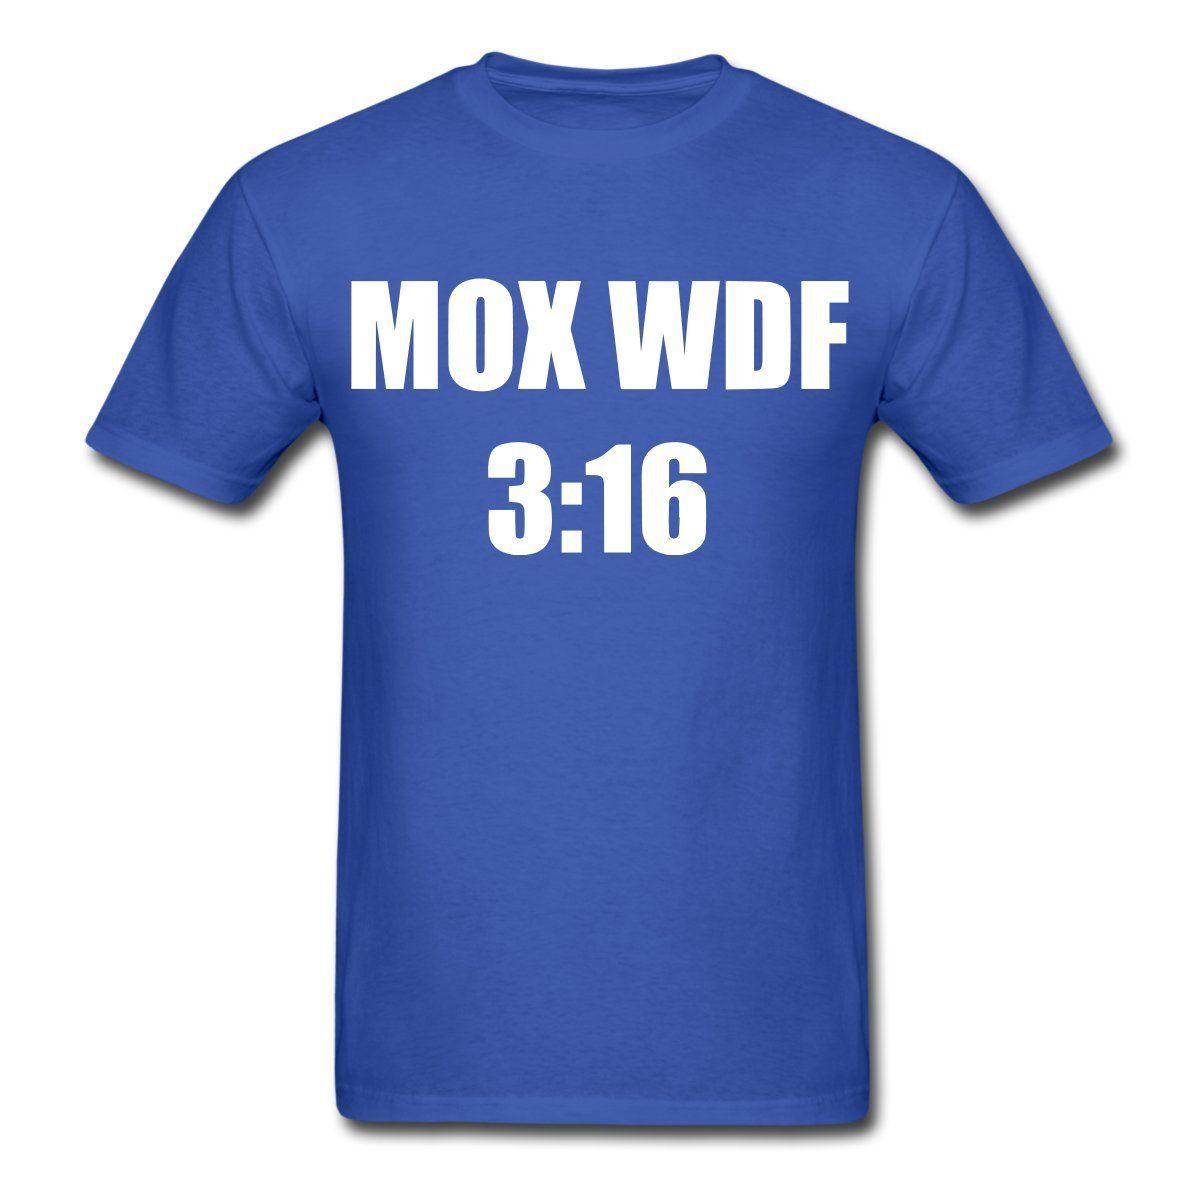 What da Faq Show MOX WDF 3:16 s T-Shirt Printed T Shirt S Short Sleeve O-Neck T-Shirts Summer Stree Twear